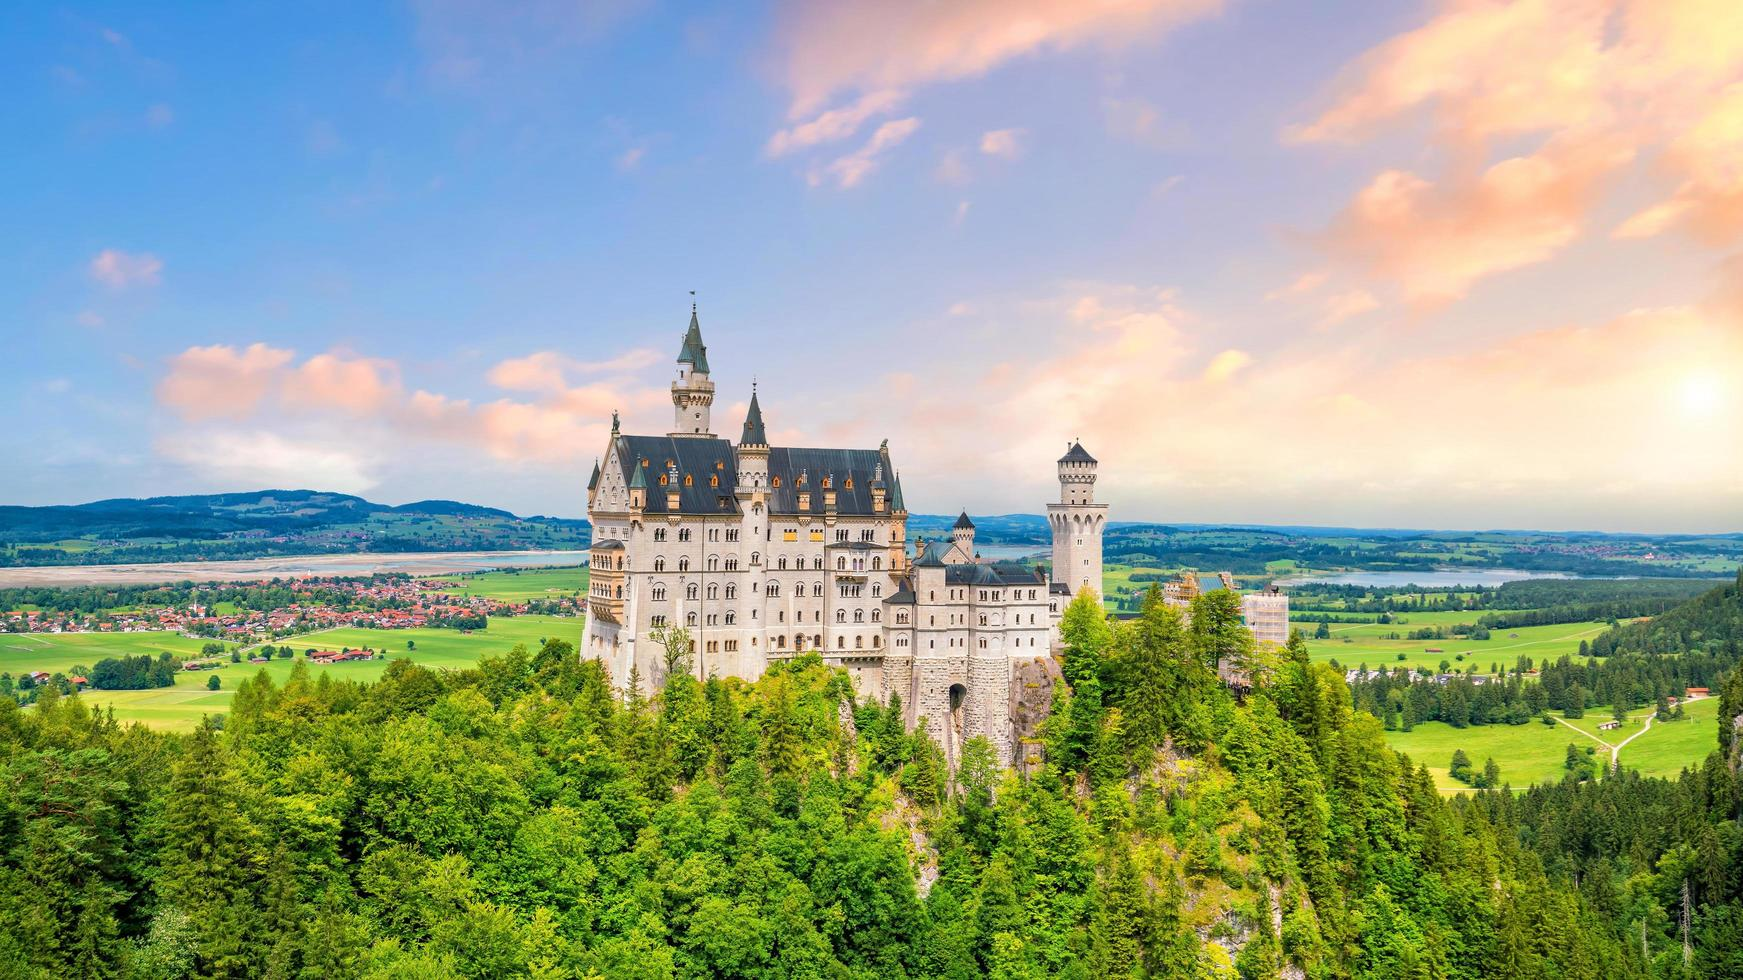 World famous Neuschwanstein Castle, Germany photo